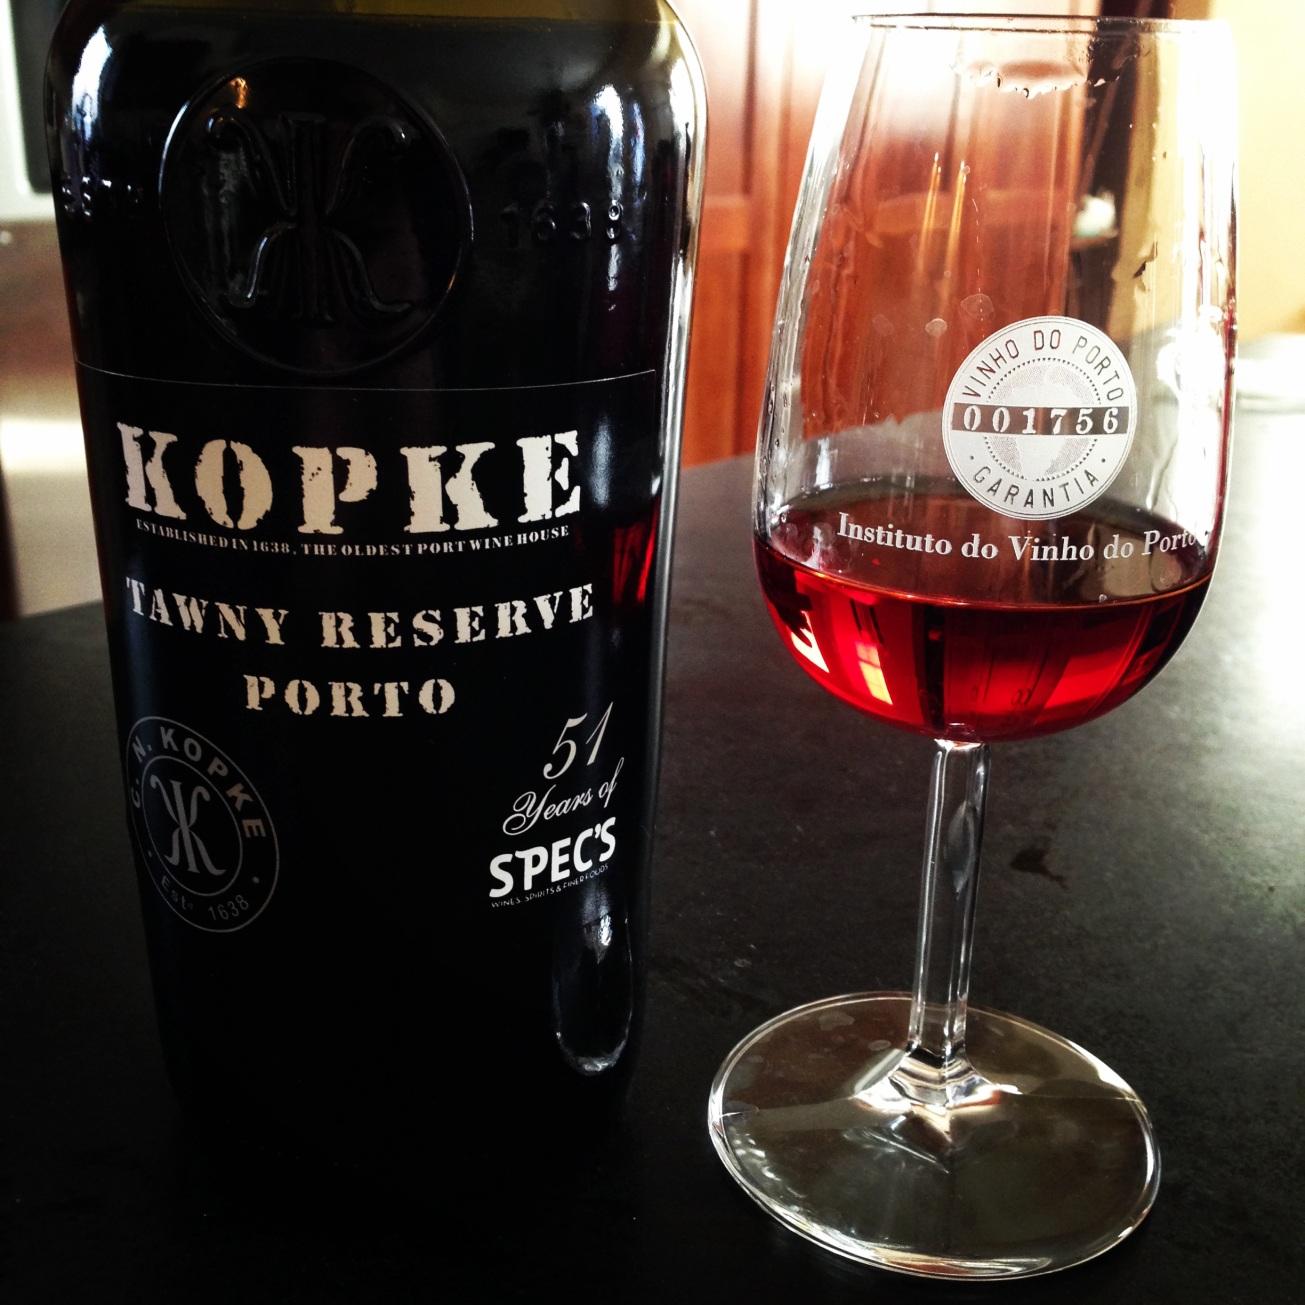 NV Kopke Porto Tawny Reserve - 51 Years of Spec's